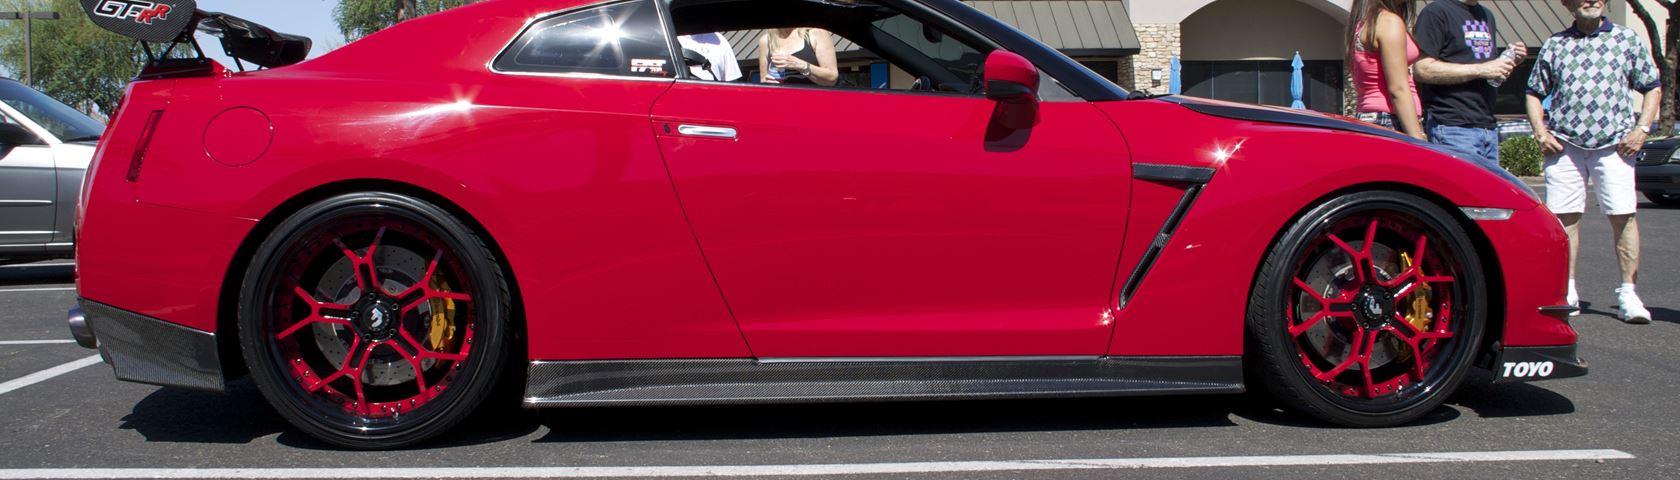 Nissan GTR Track Edition